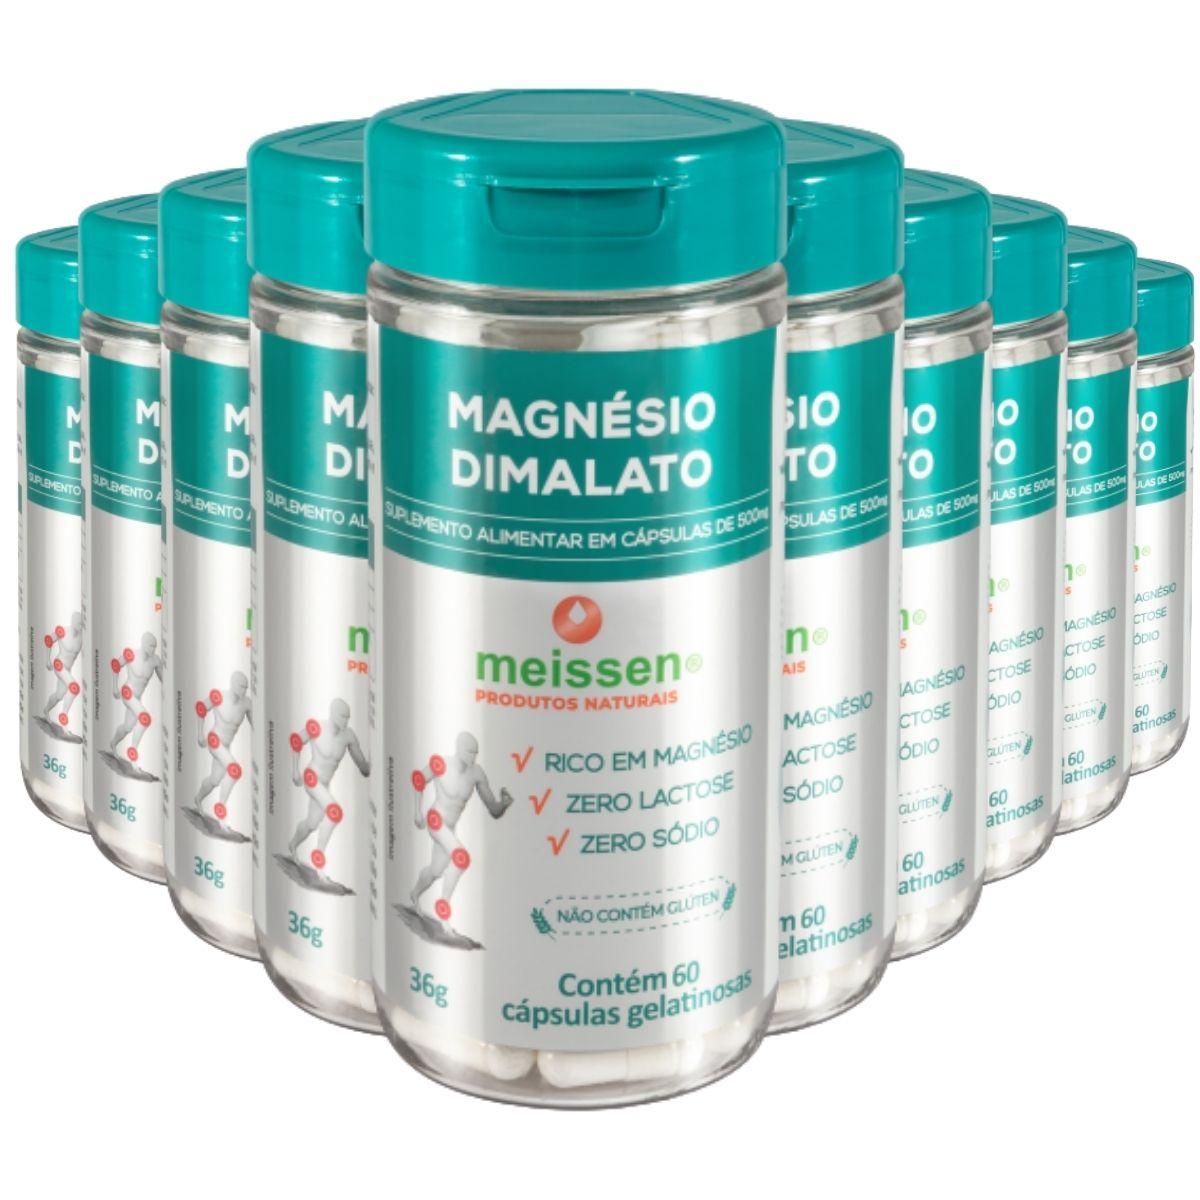 10x Magnesio Dimalato 600 Capsulas - 2 Cáps x Dia - Meissen